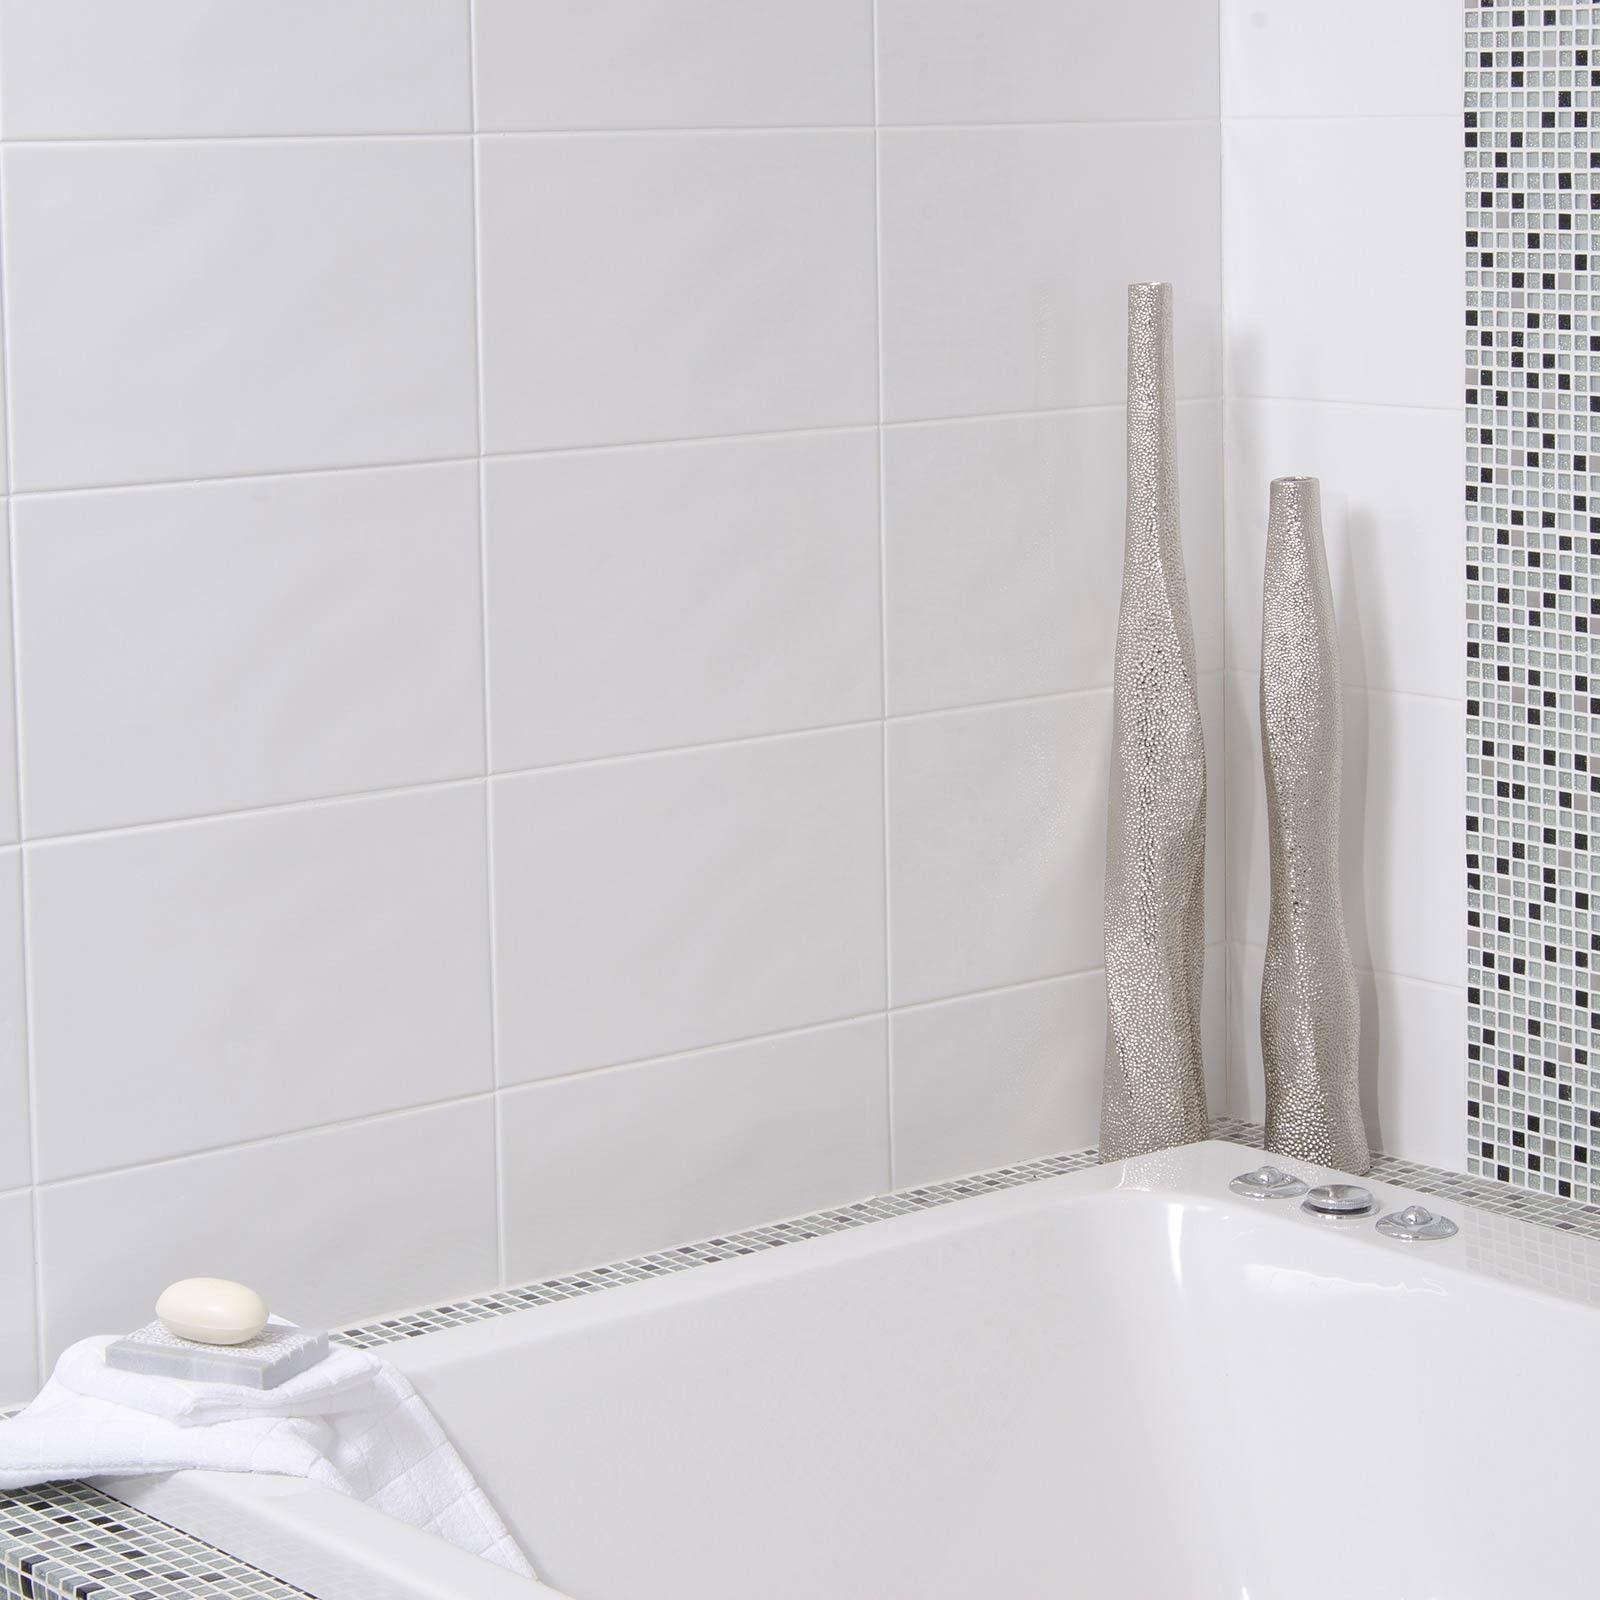 Beret Blanco Tile - Black And White Bathroom Ideas - White Tiles ...